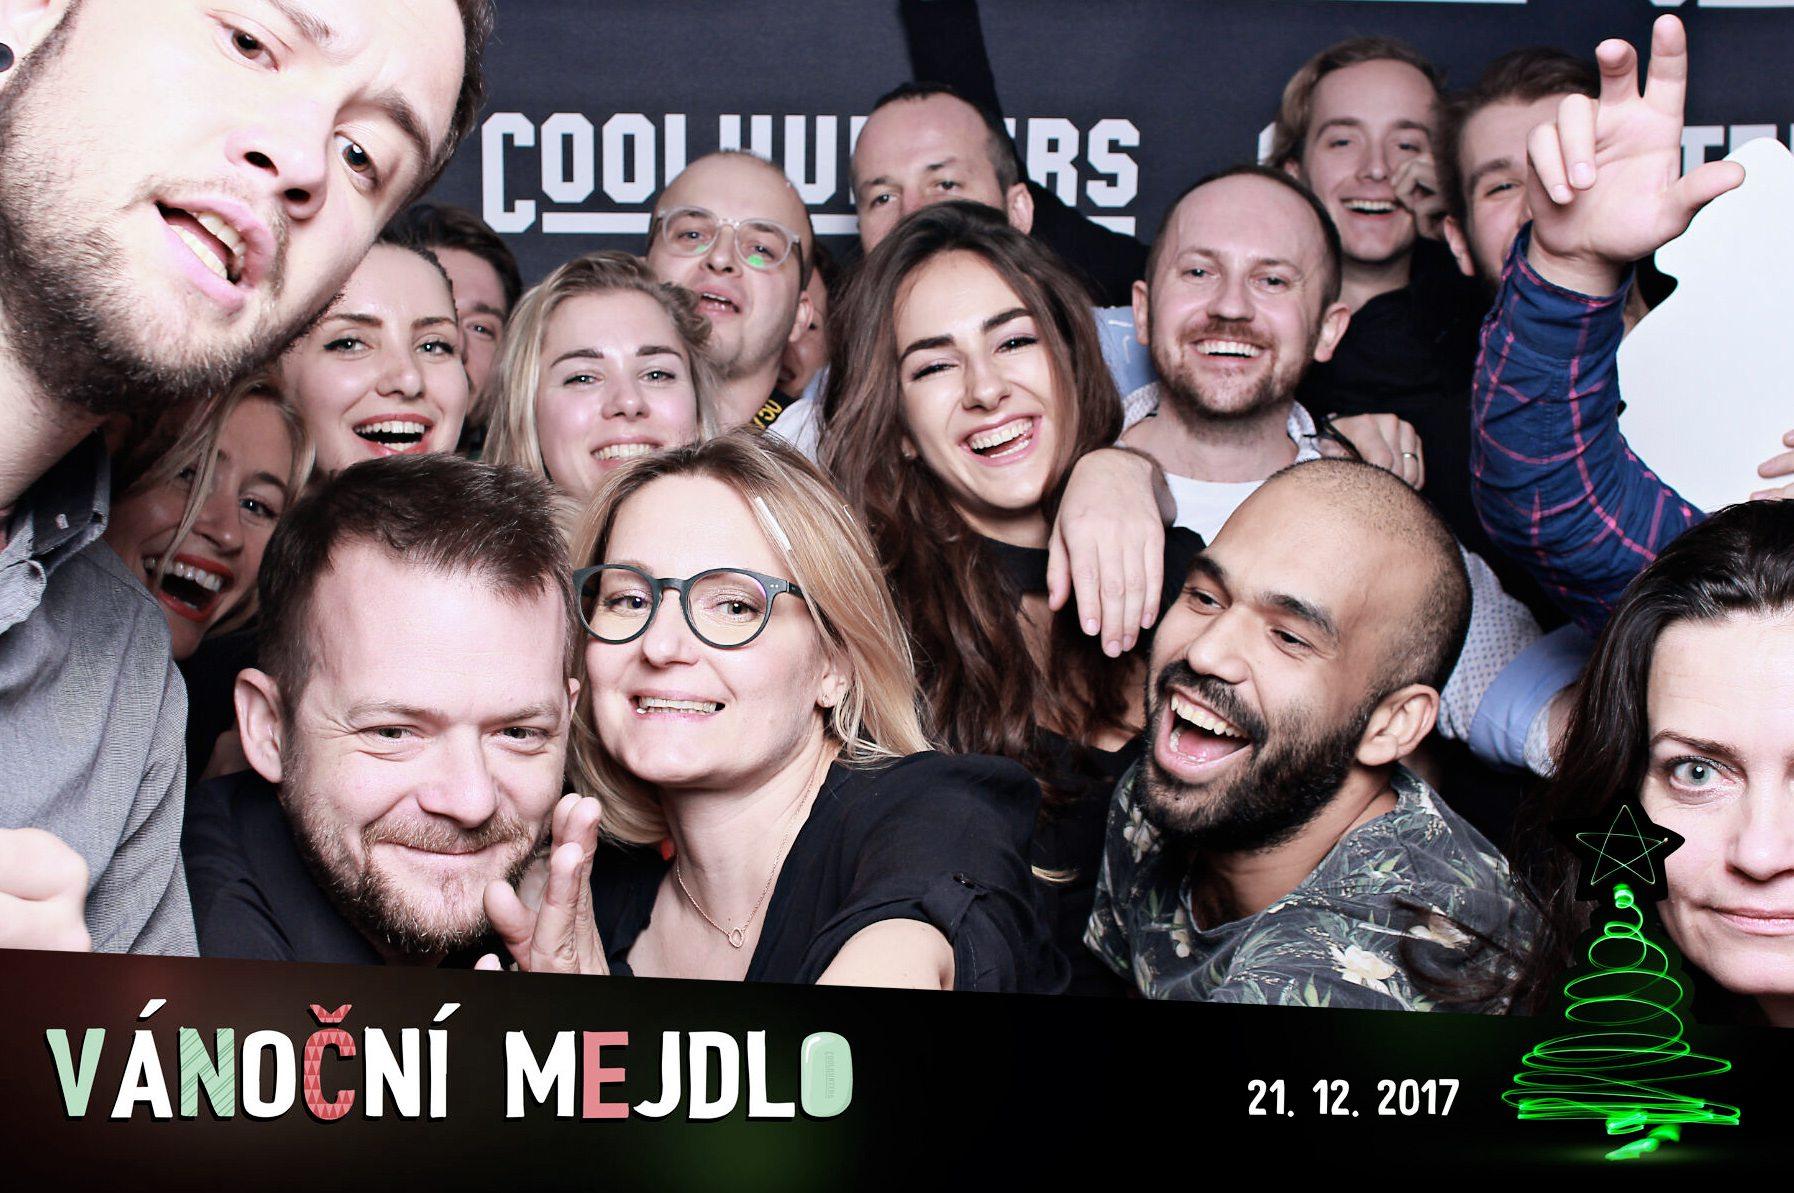 fotokoutek-coolhunters-21-12-2017-375824